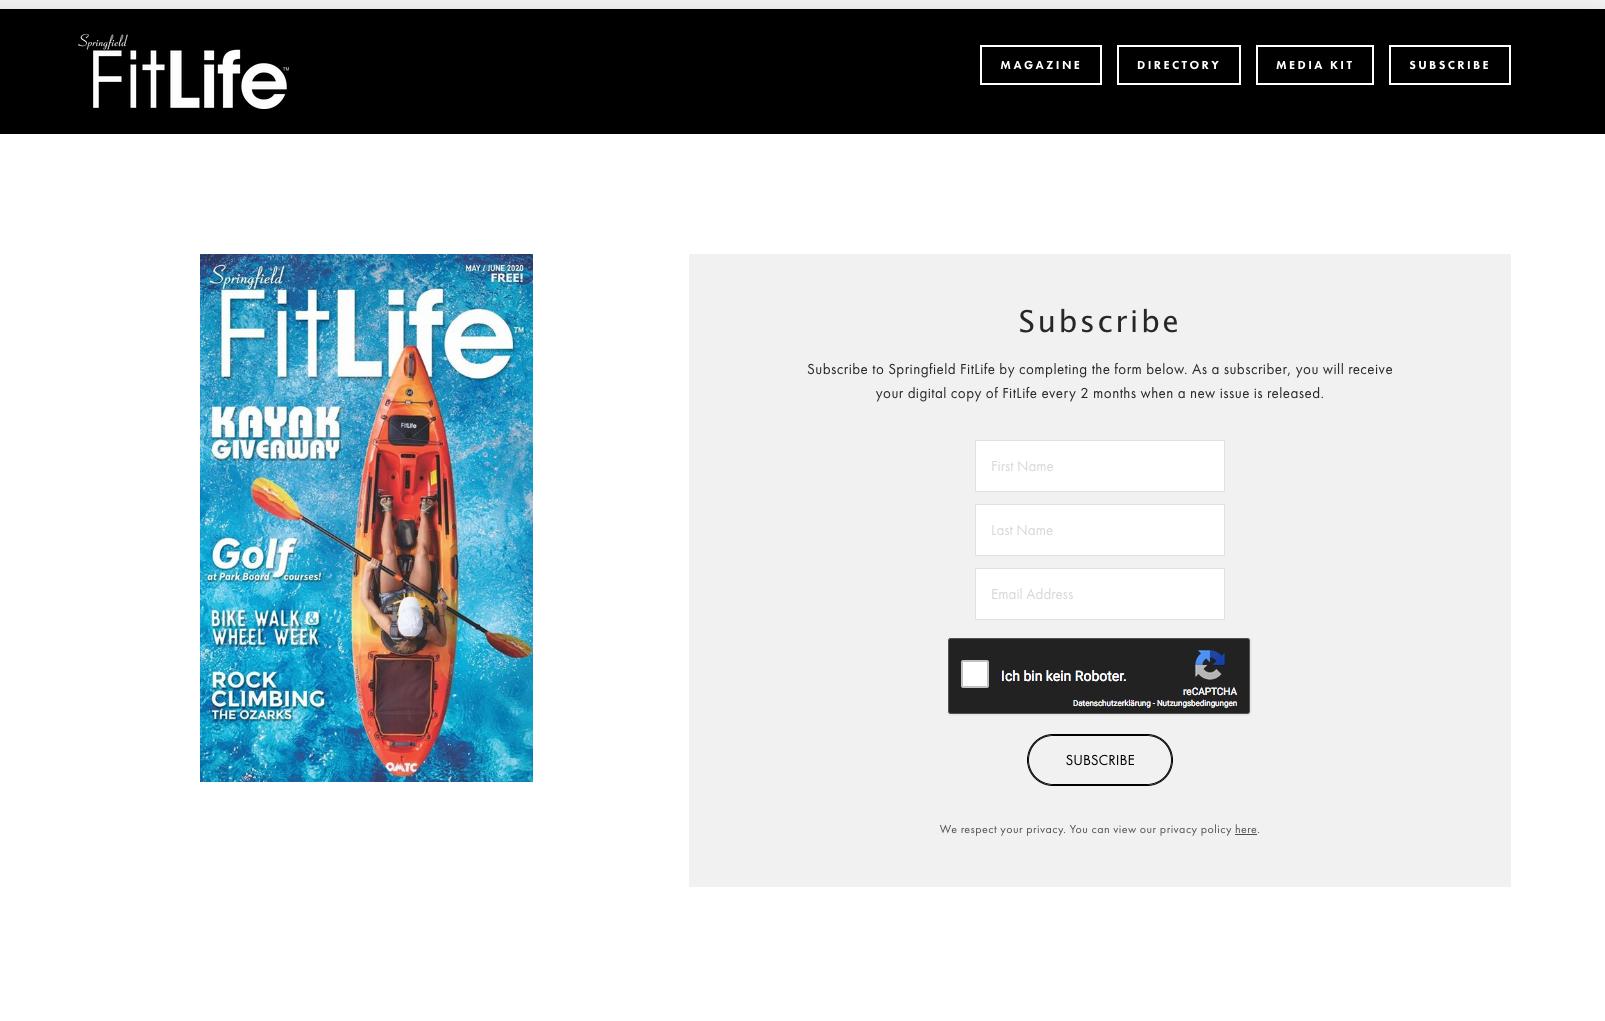 FitLife Magazine